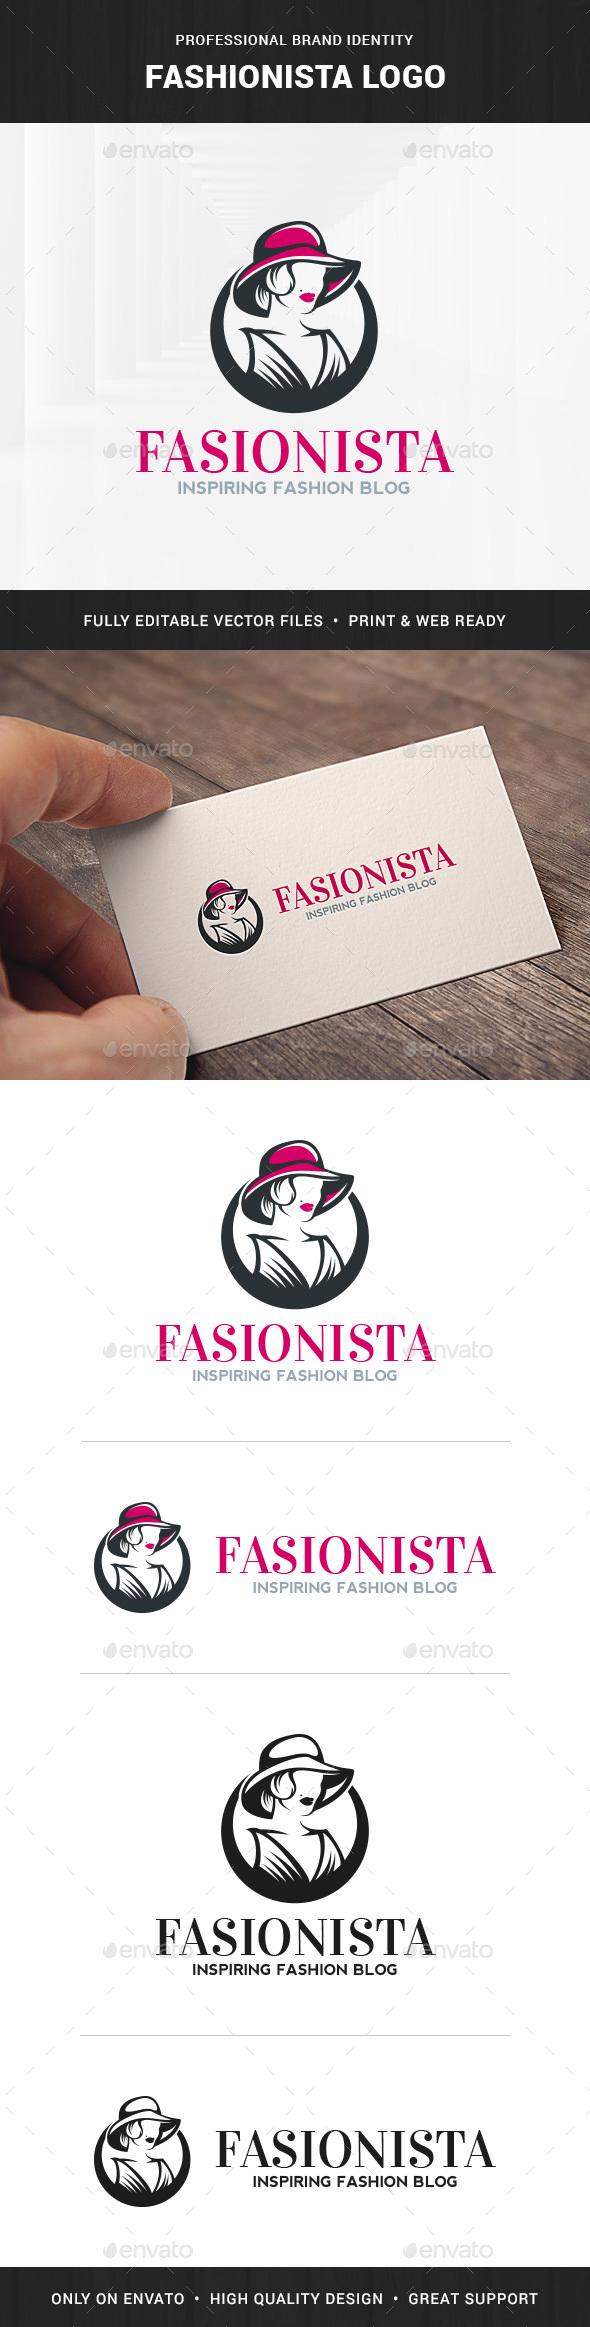 Fashionista Logo Template